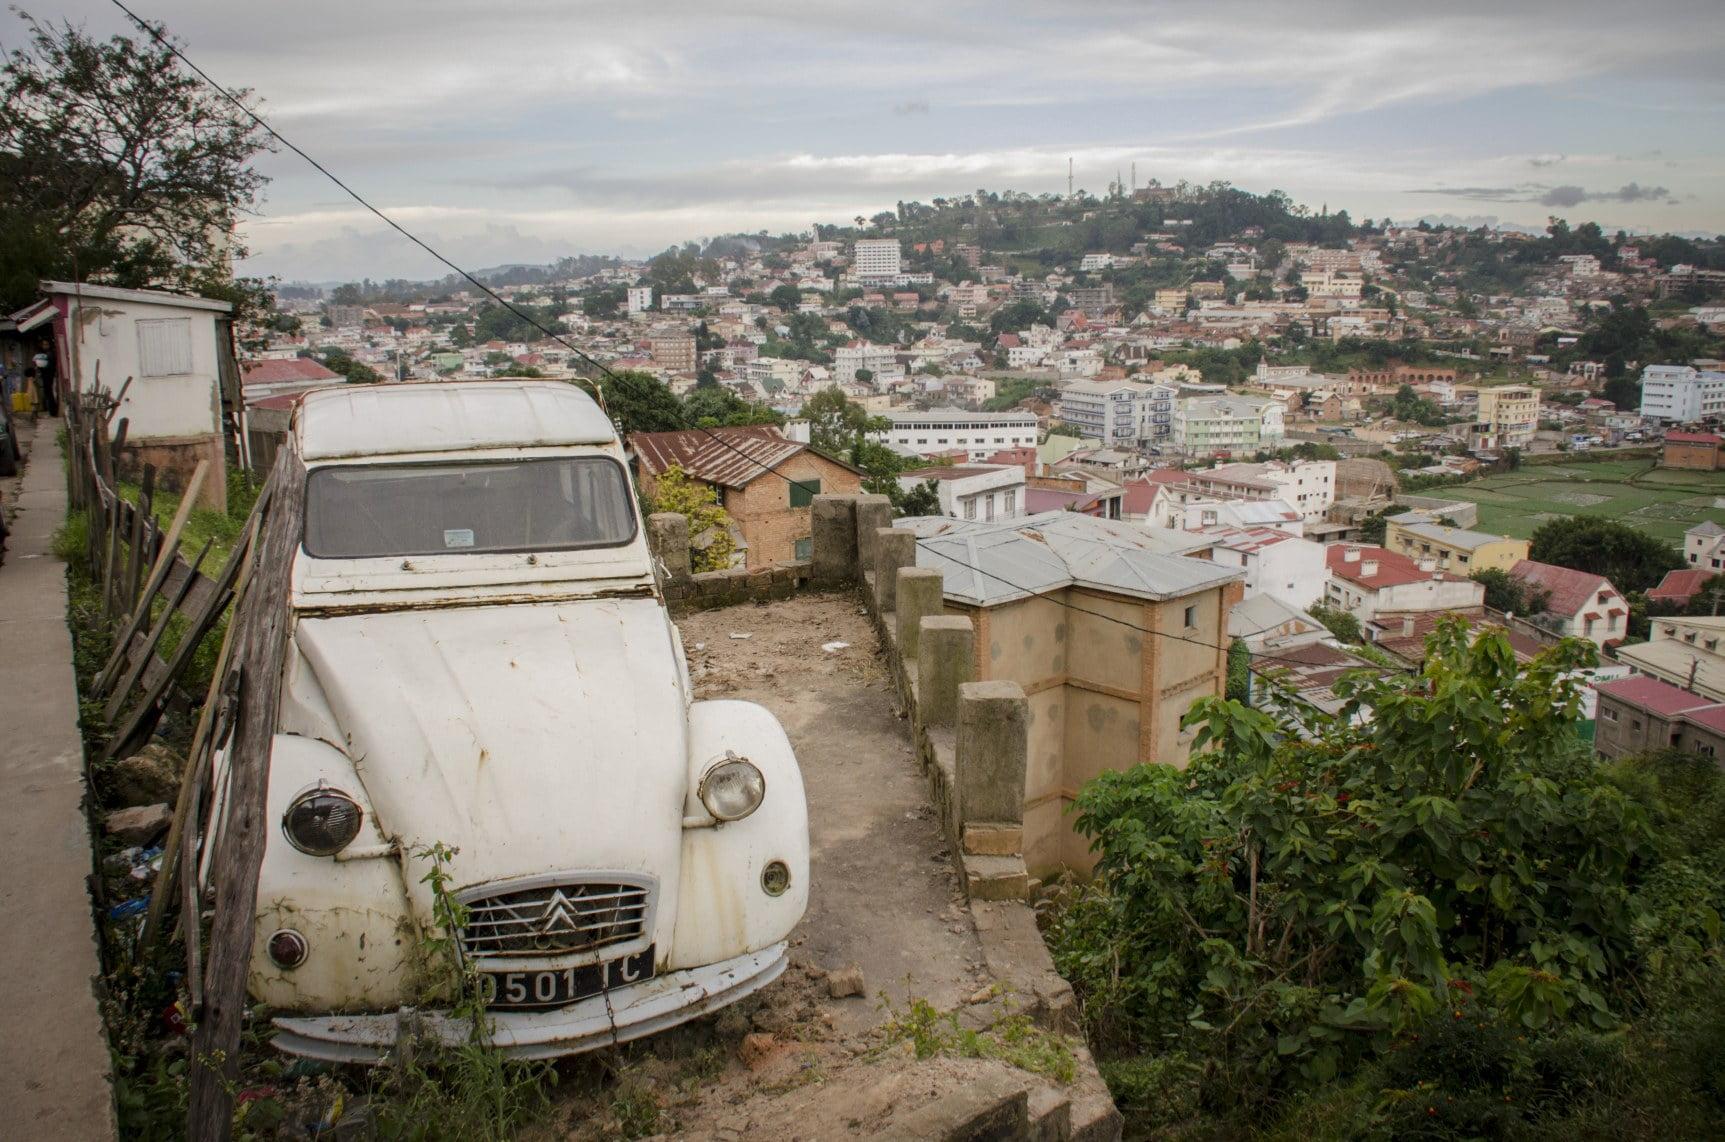 Things to do in Antananarivo, Madagascar